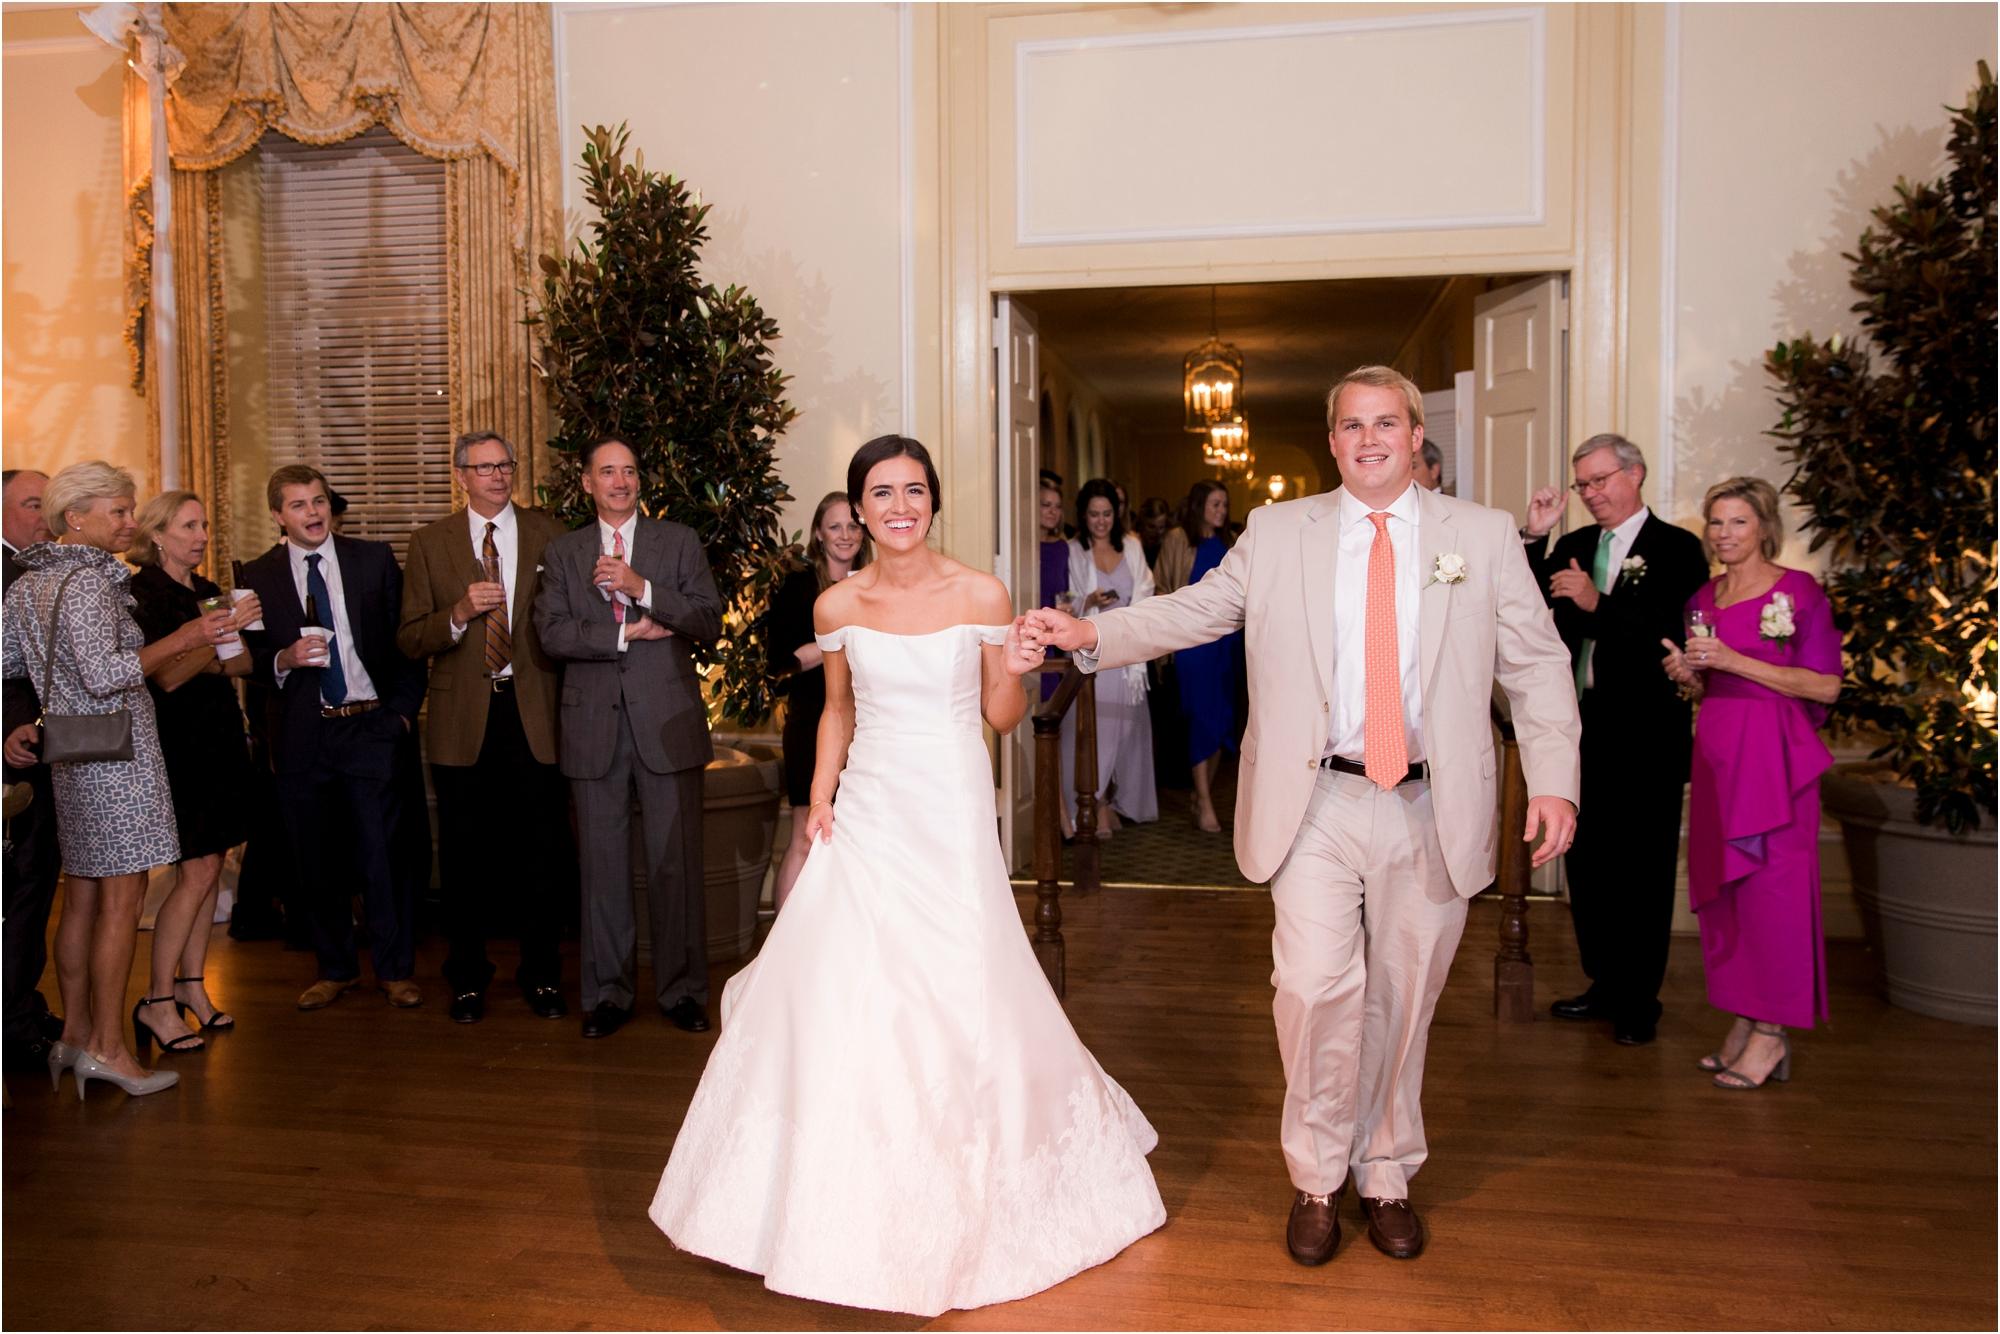 claire-thomas-farmington-country-club-charlottesville-virginia-wedding-photos_0038.jpg